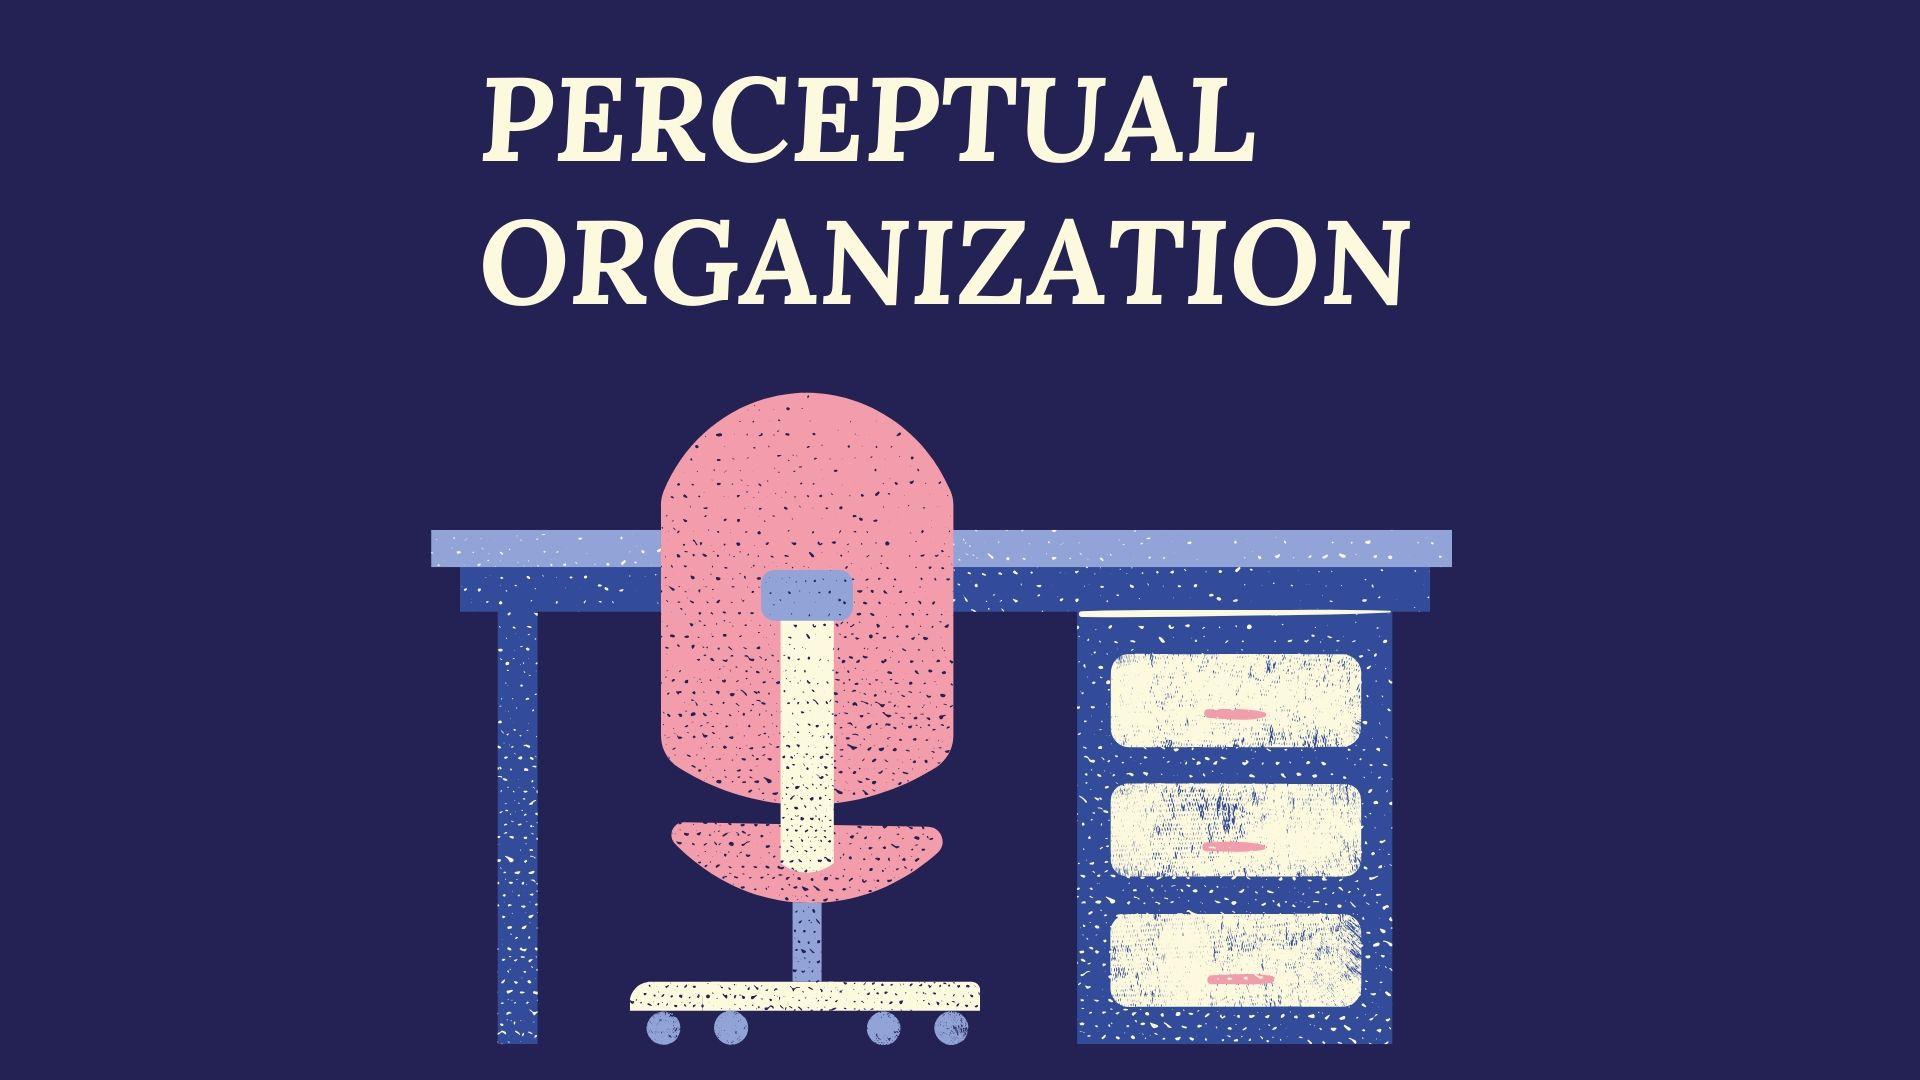 What is Perceptual Organizational